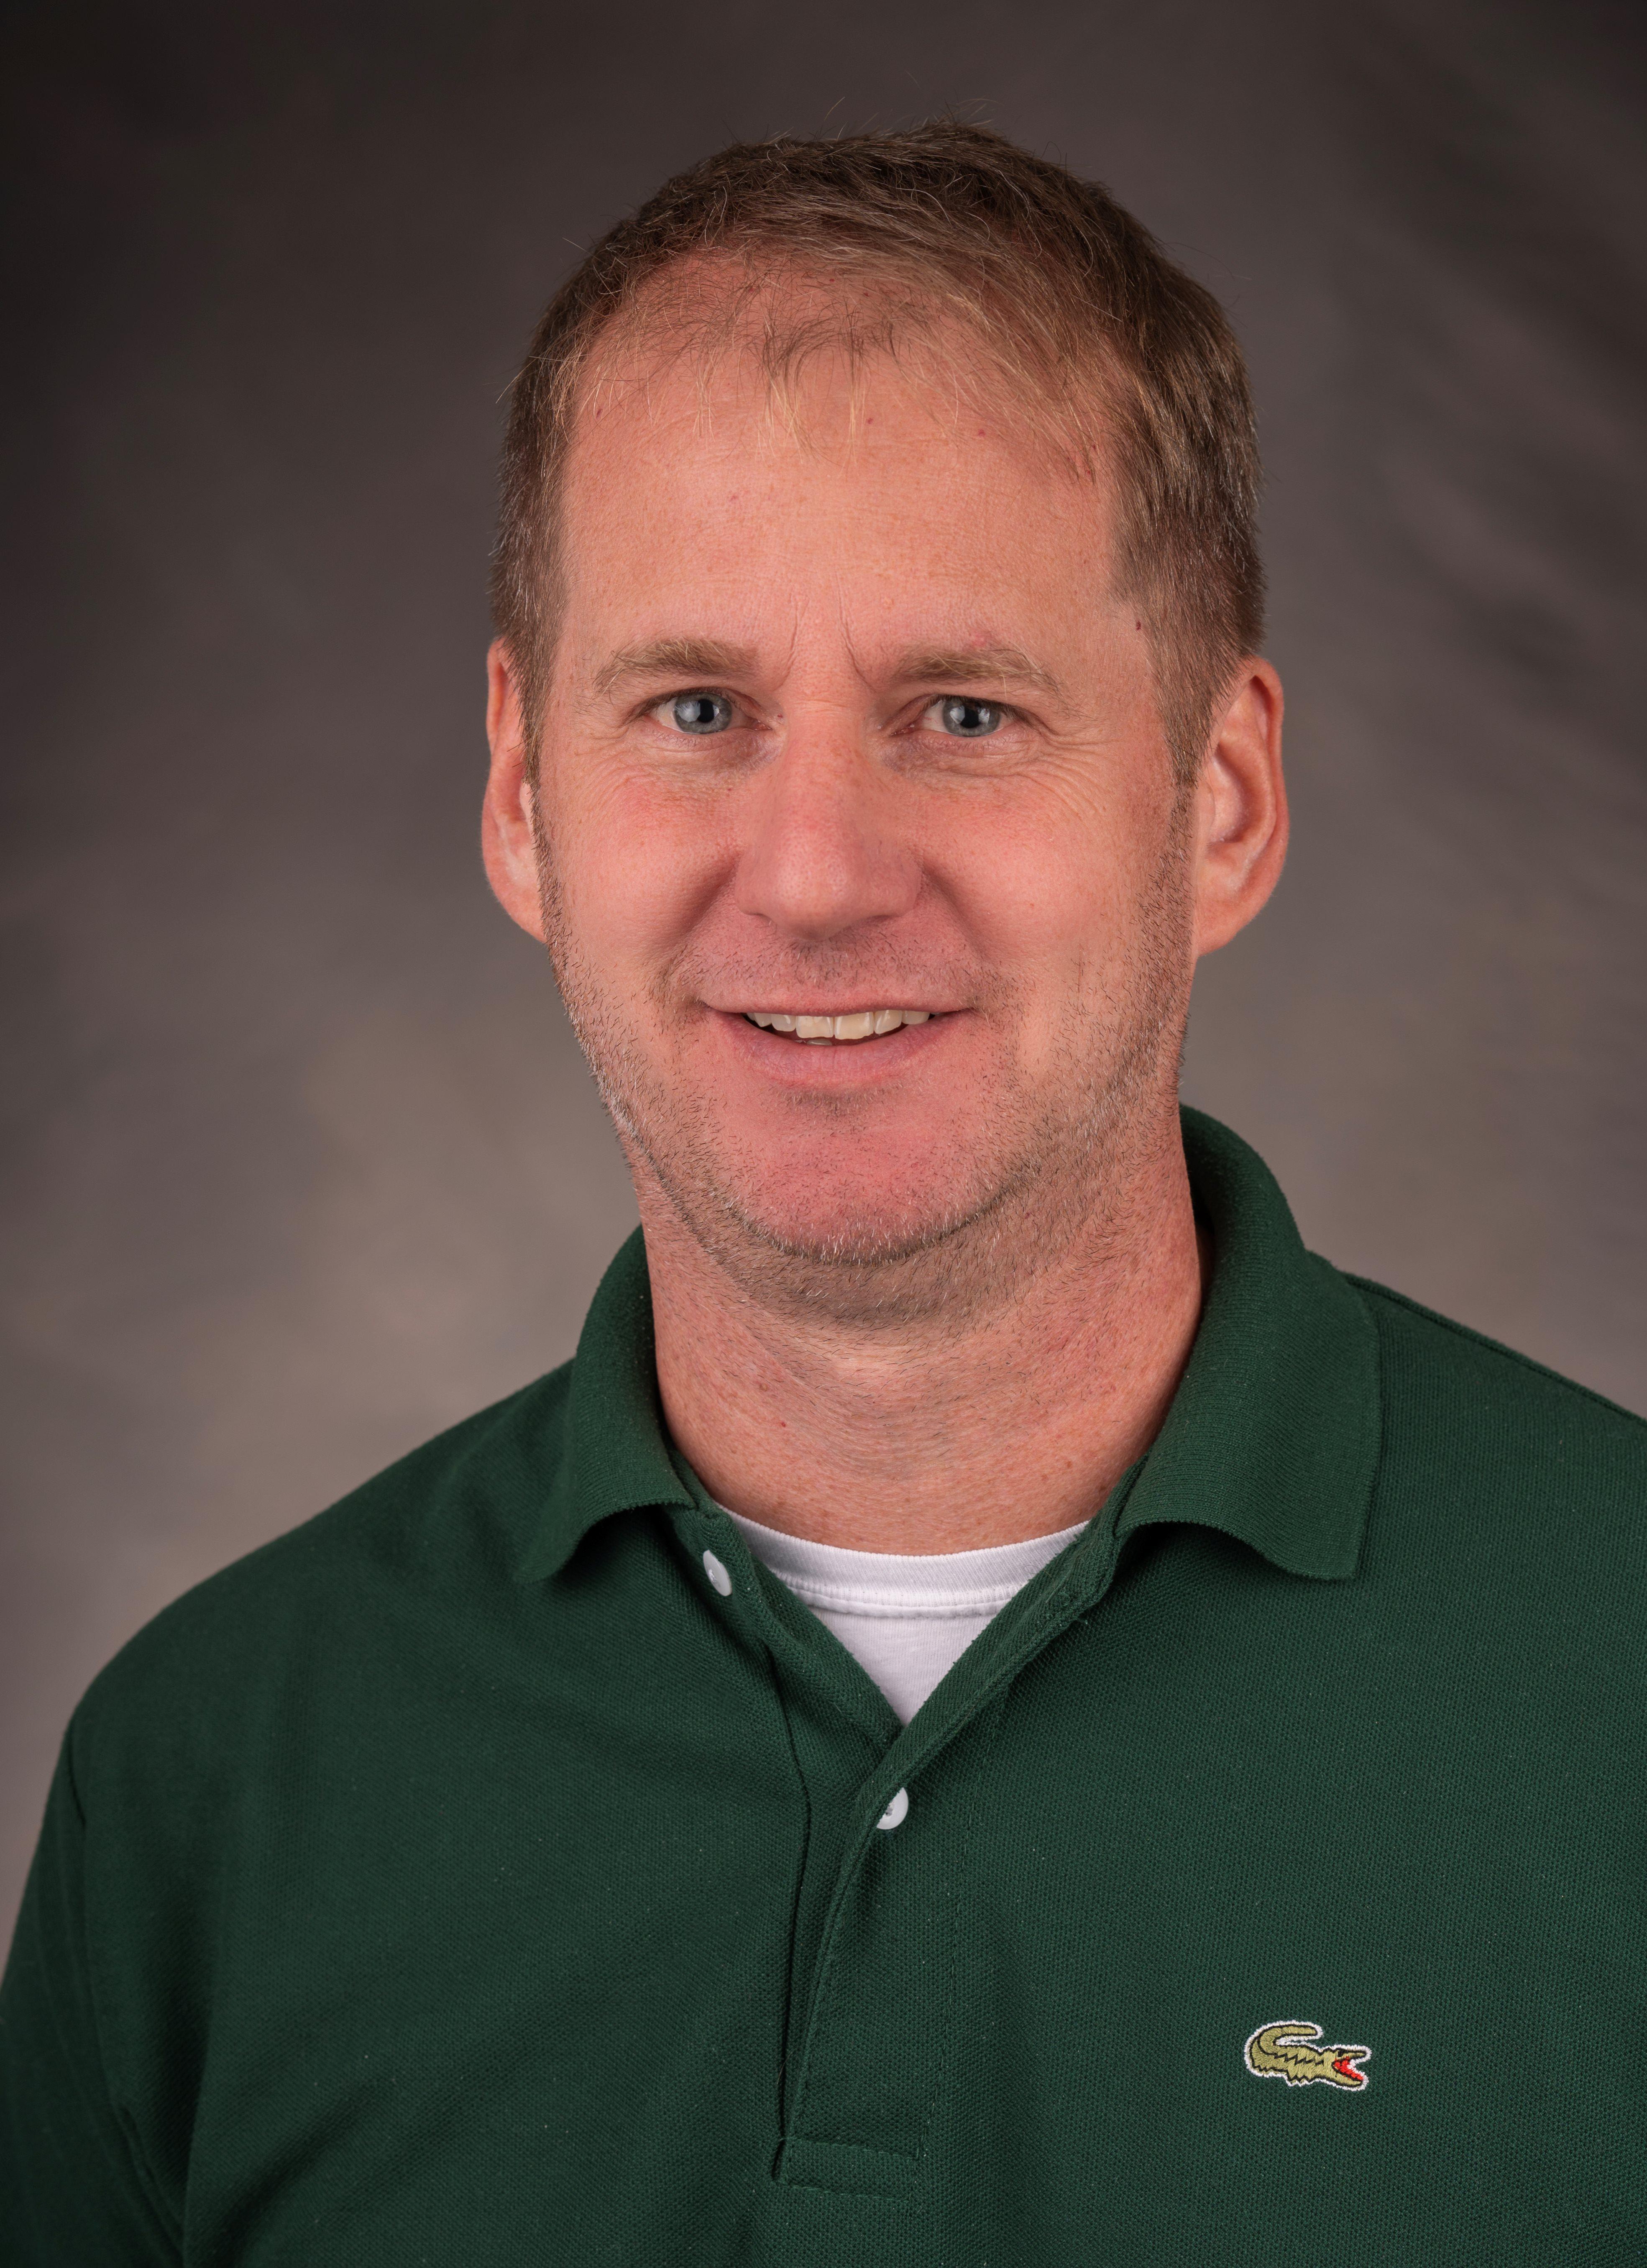 Dr. Jeff Carpenter